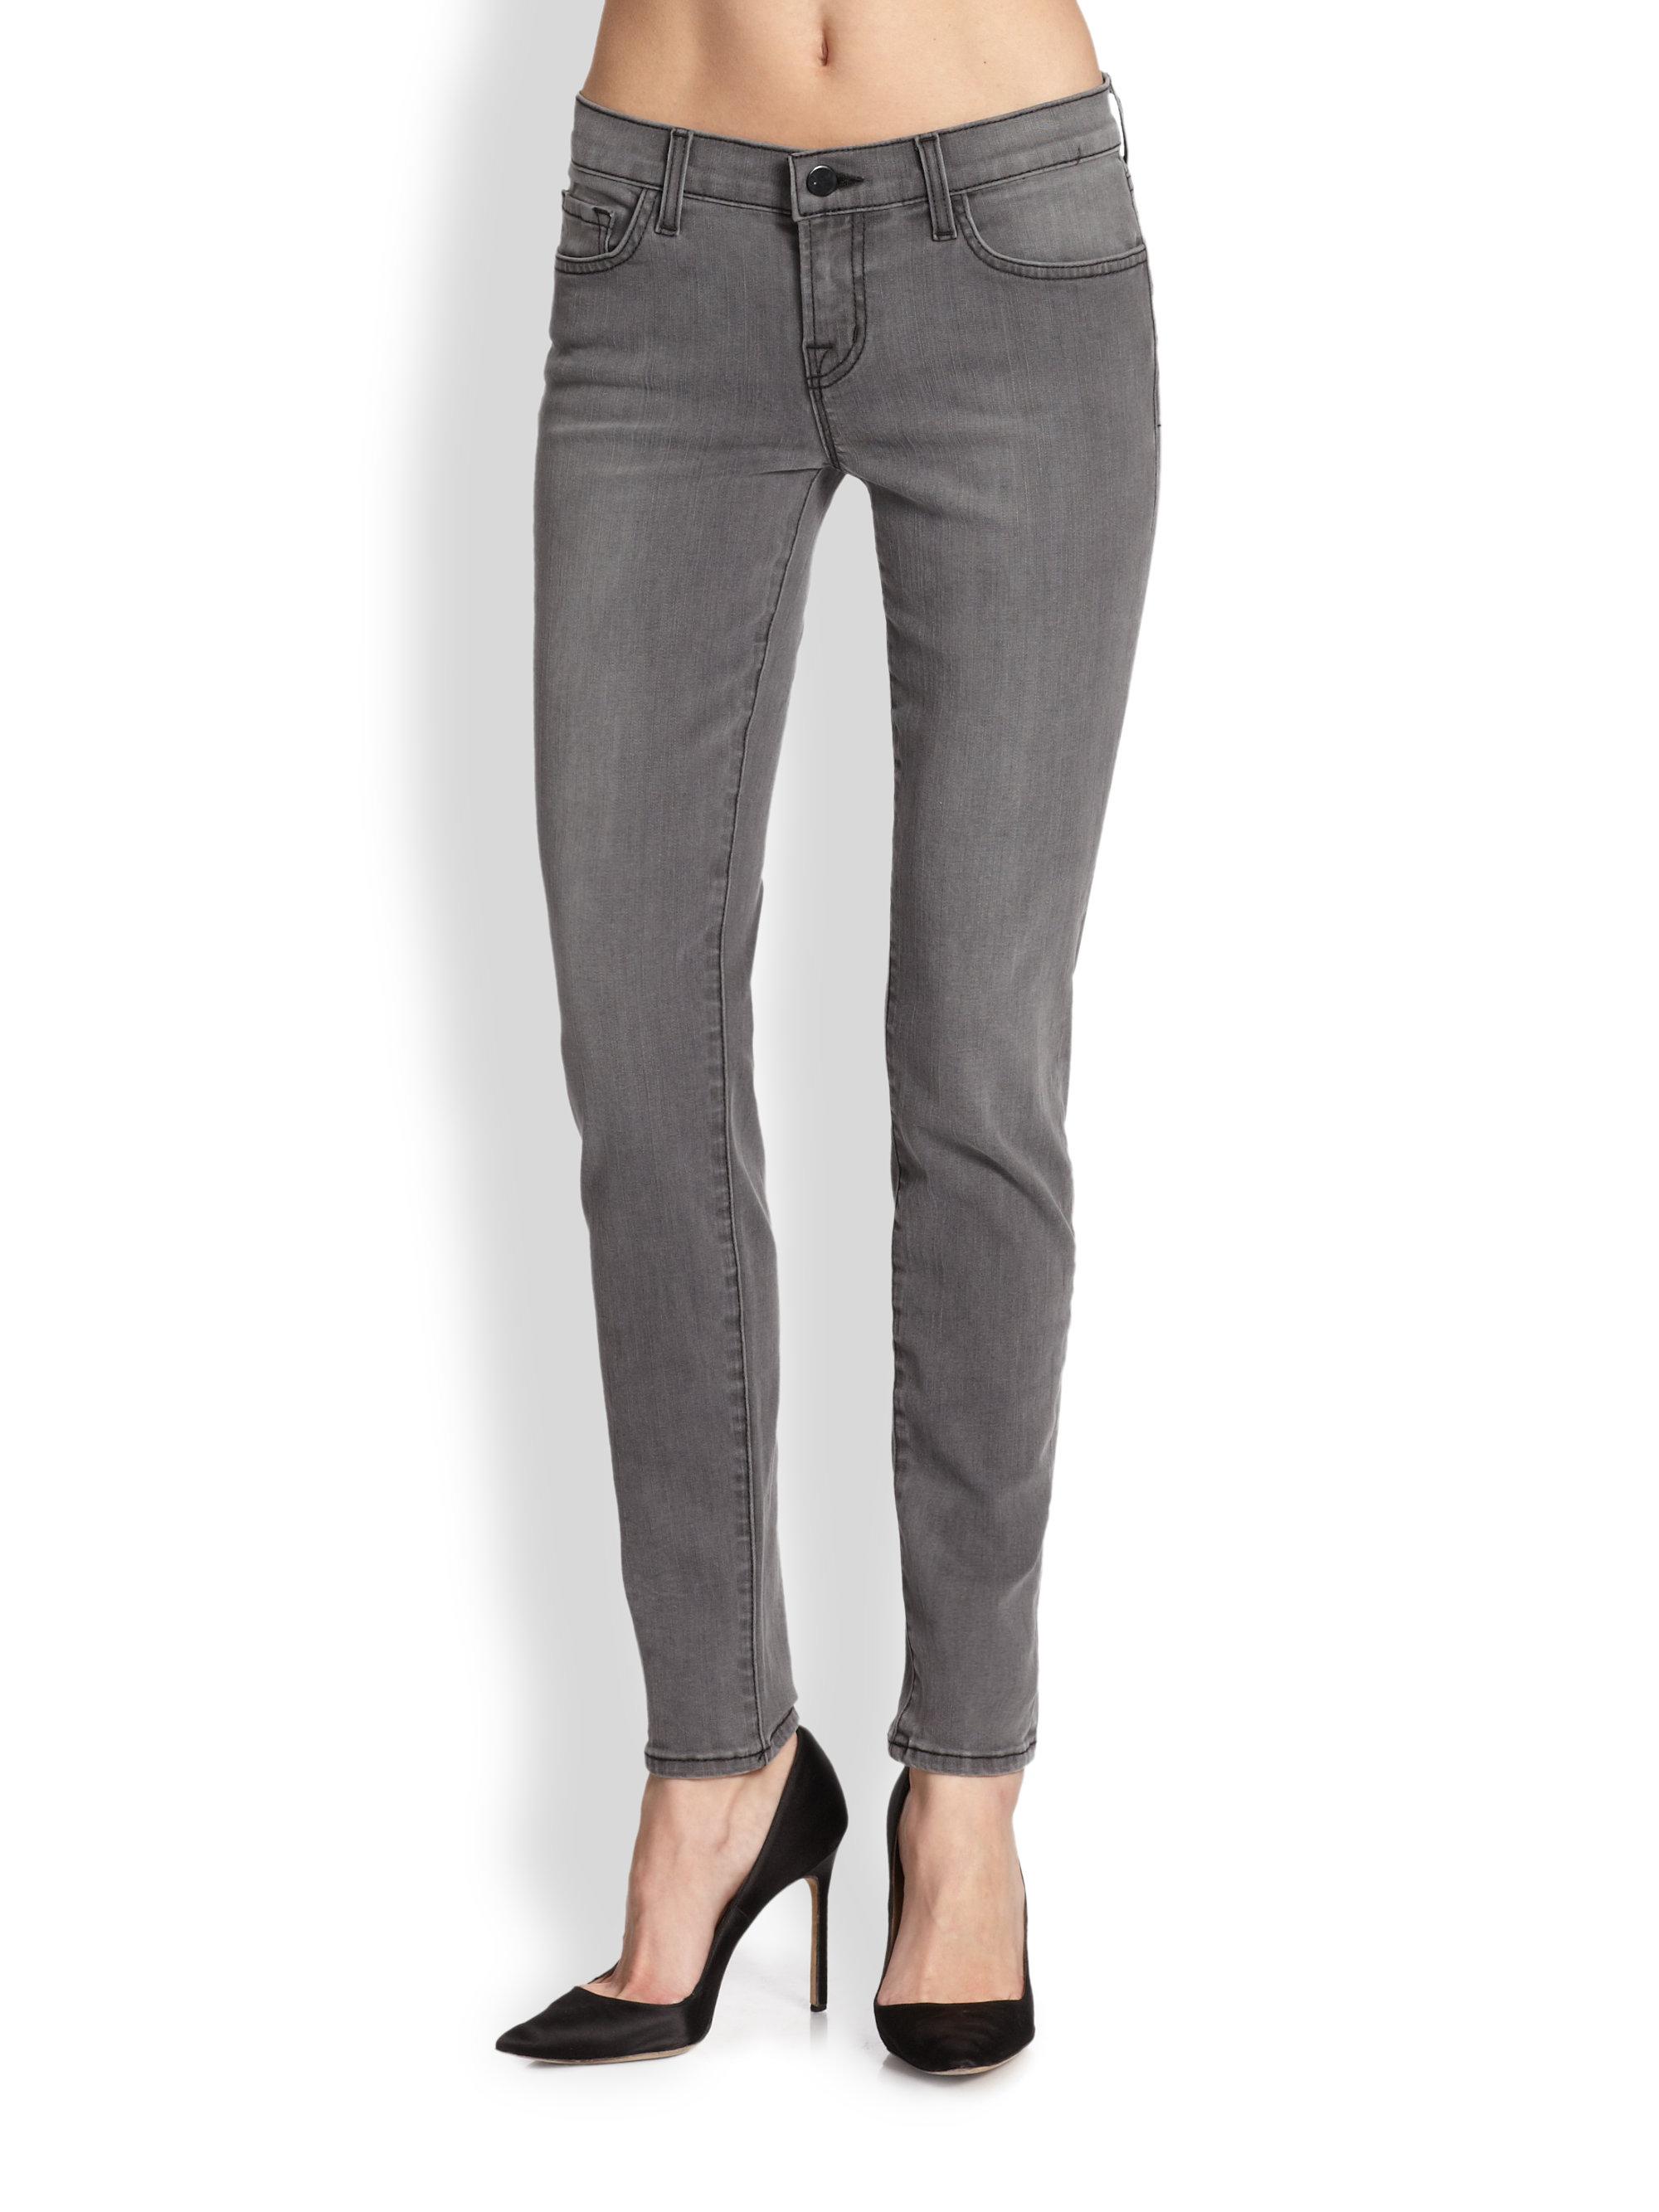 j brand photo ready 910 super skinny jeans in black onyx. Black Bedroom Furniture Sets. Home Design Ideas